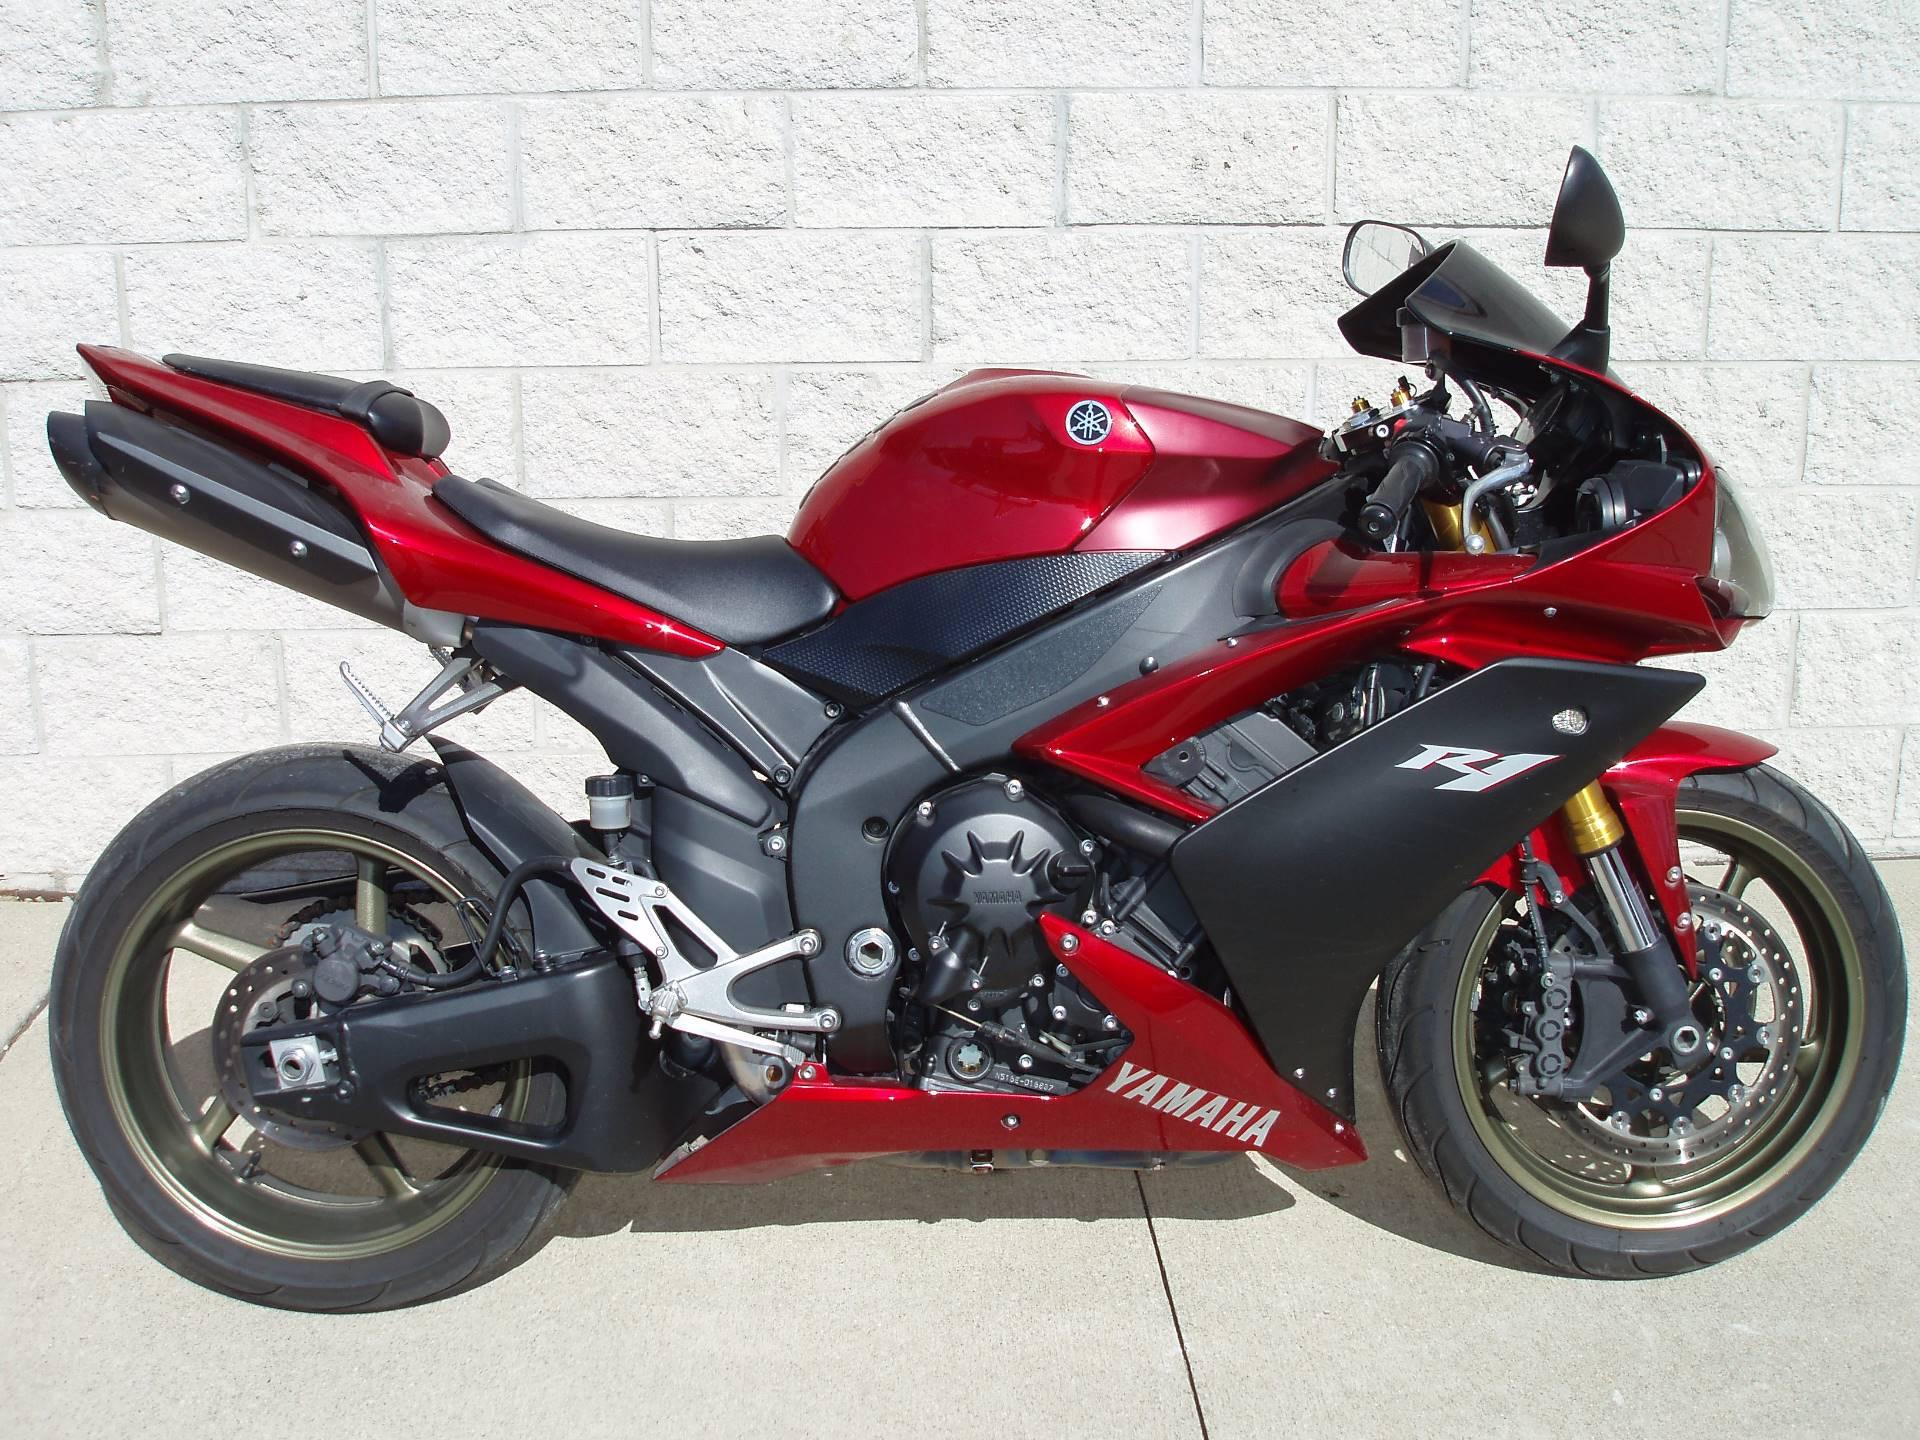 2008 Yamaha YZF-R1 for sale 106911